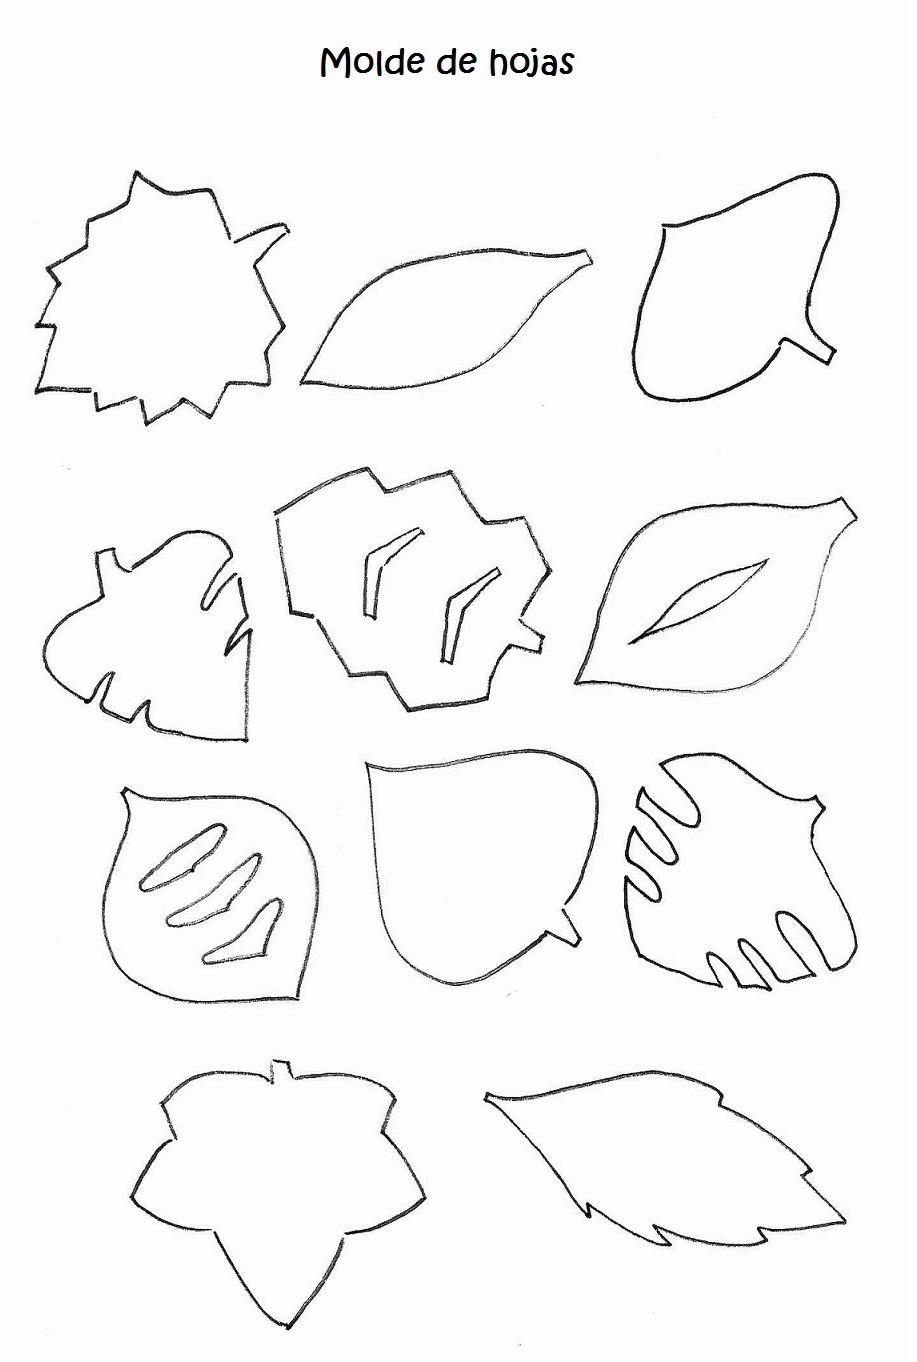 Plantilla De Dibujos. Cheap Plantilla De Flor De Lis Dibujo Para ...